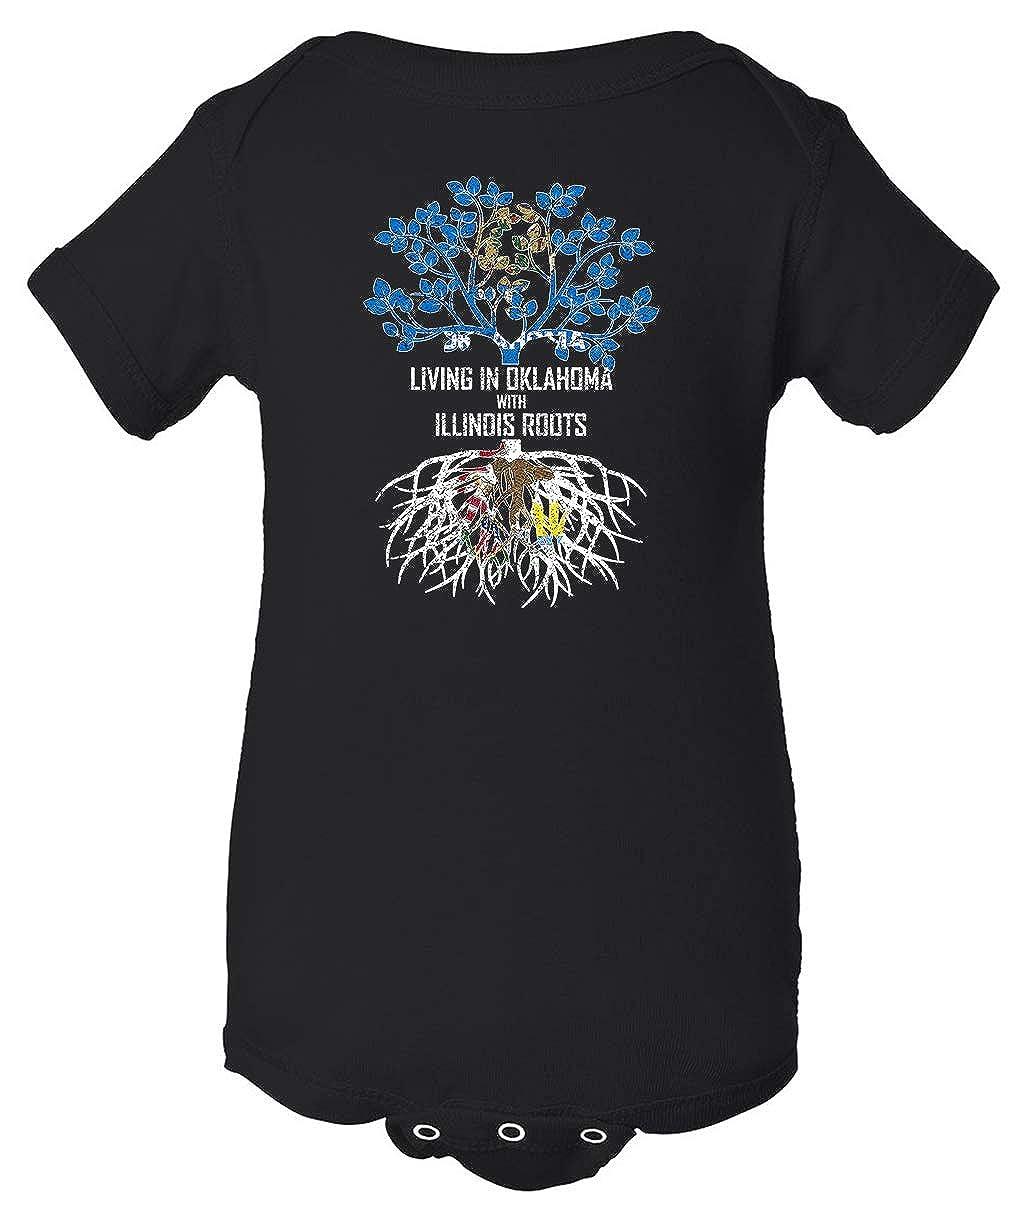 Tenacitee Babys Living in Oklahoma Illinois Roots Shirt